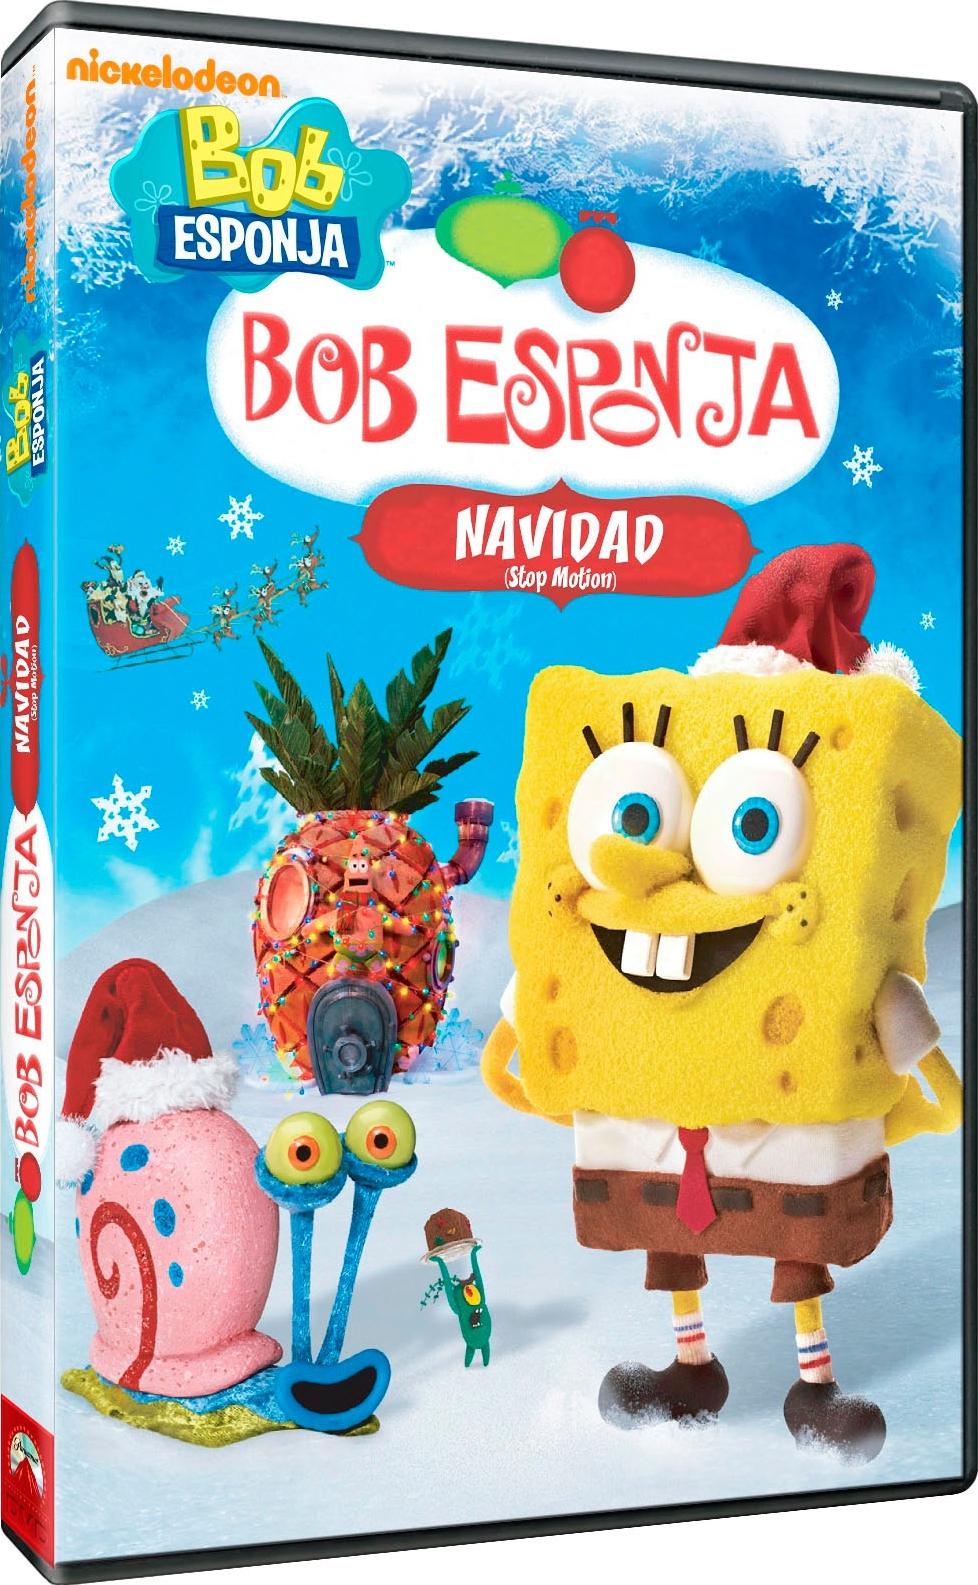 Image - It's a SpongeBob Christmas 2.png | Encyclopedia ...